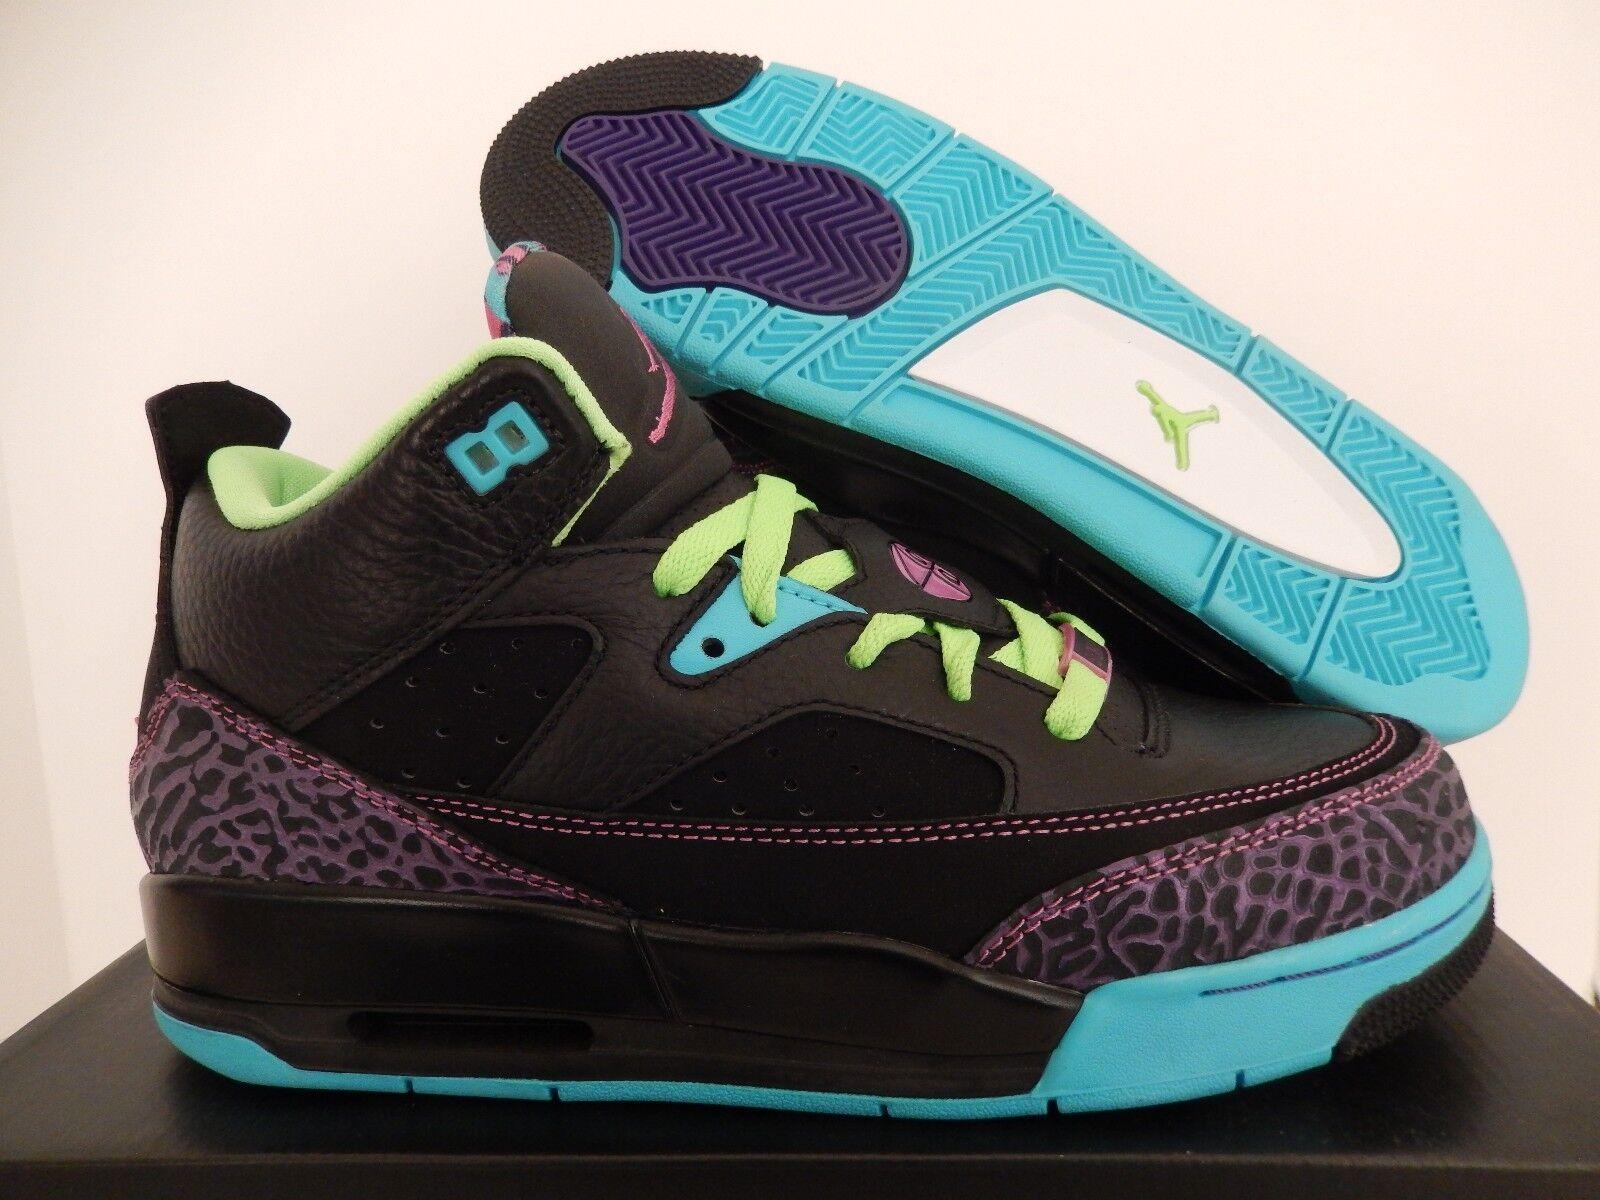 Nike Air Jordan Son Talla of Low Gs Negro Talla Son 5.5Y - Mujeres Talla 7 Bel Air c504b8